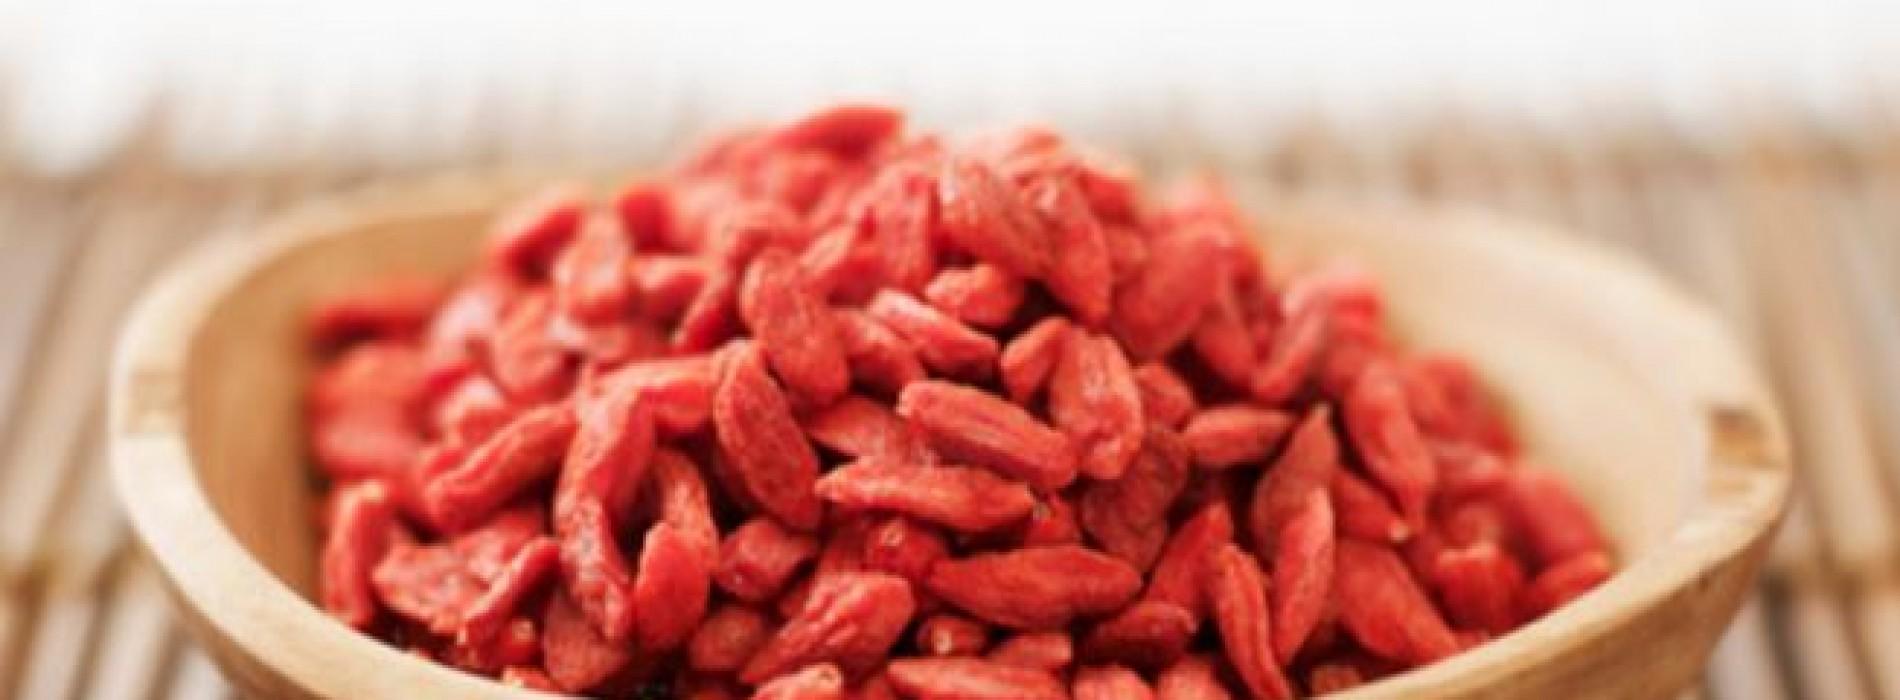 Getting the rich benefits of health through goji berries nutrition